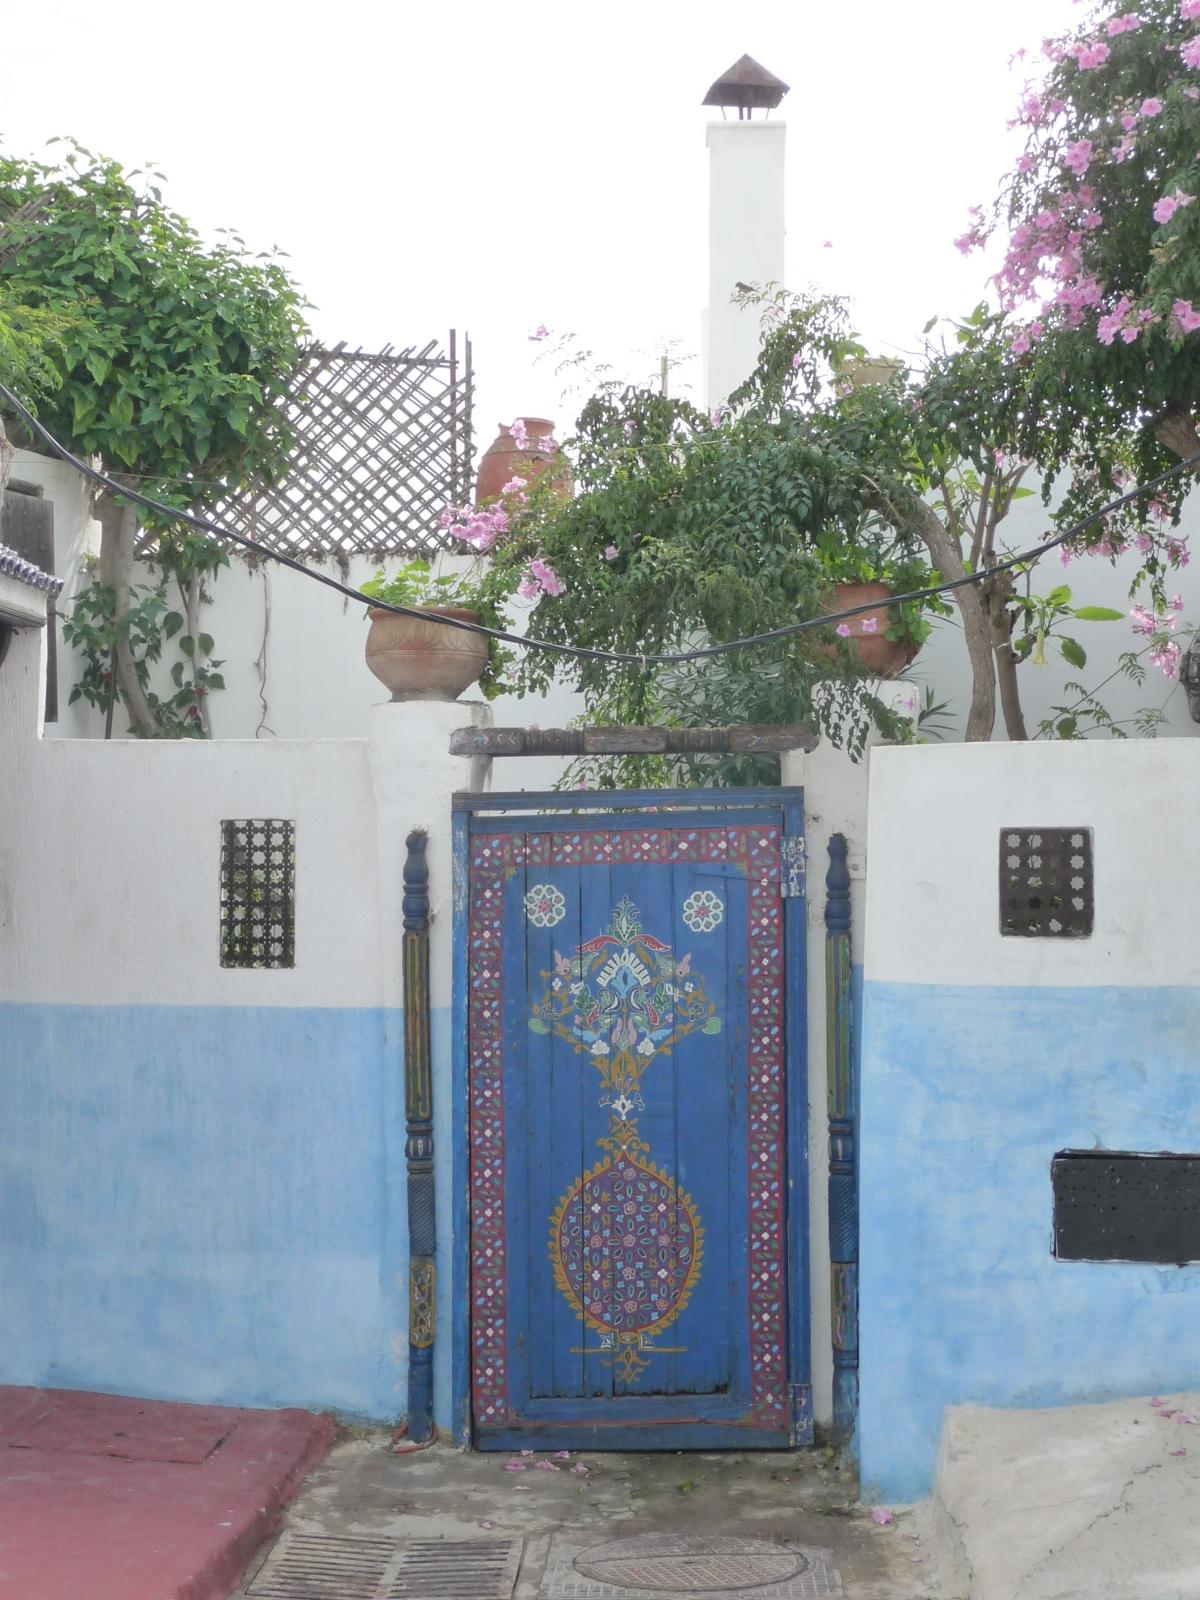 Morocco 2010 199